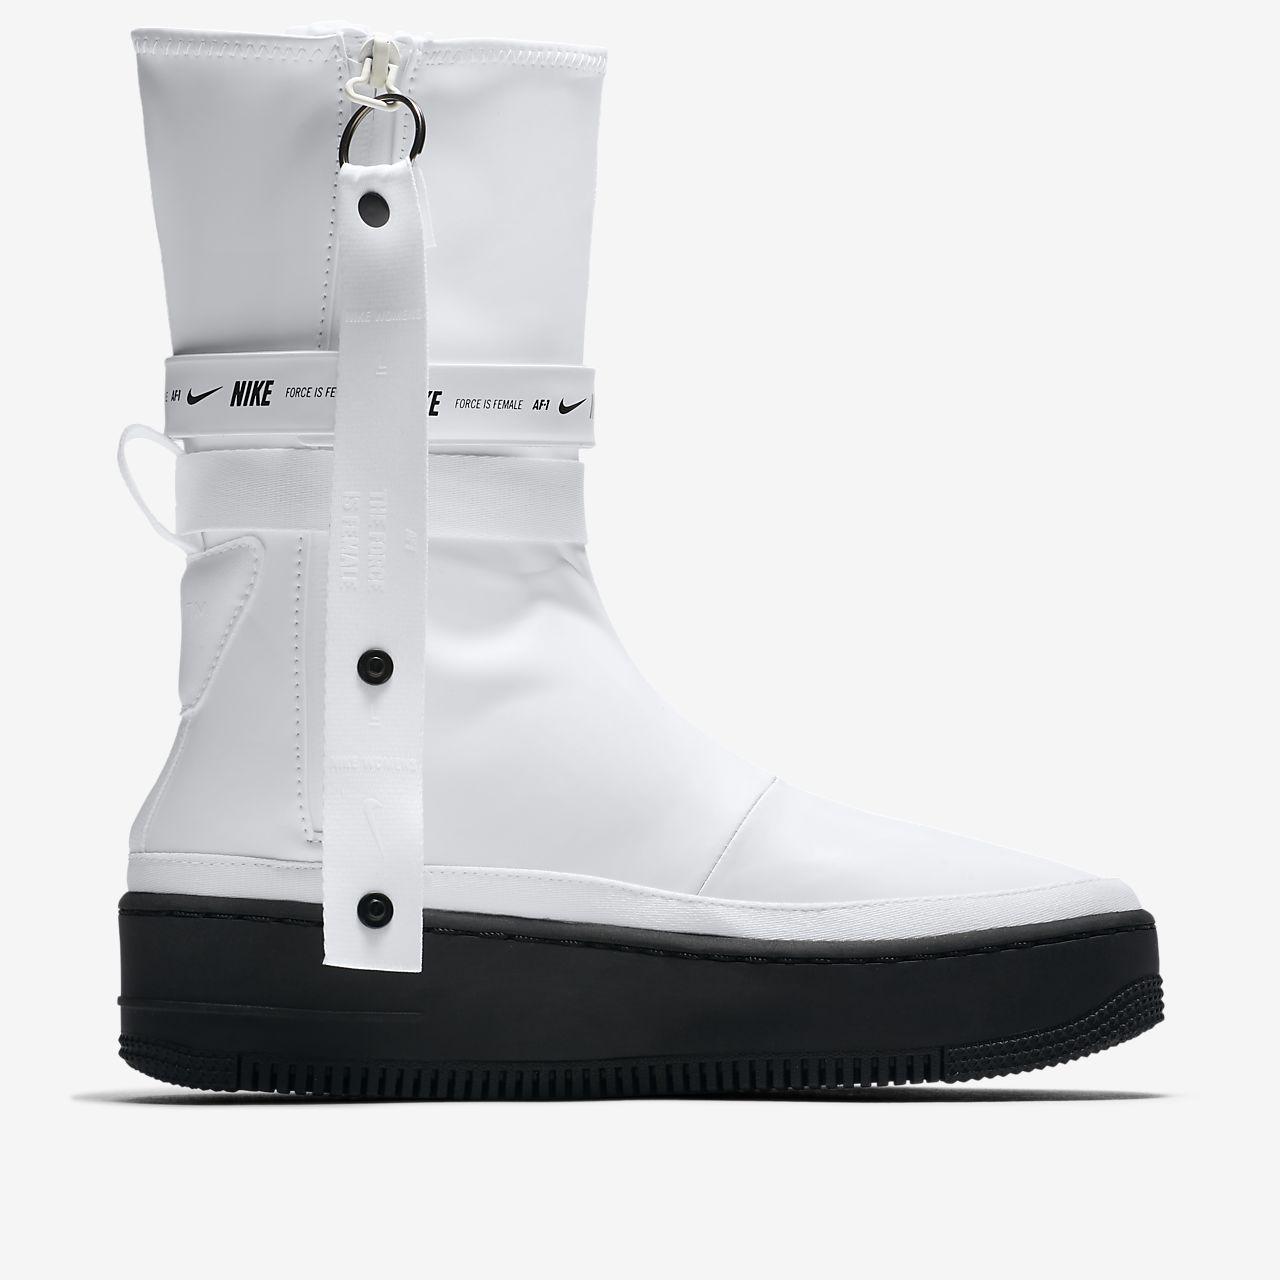 wholesale dealer c7690 b69c2 Nike Air Force 1 Sage High Women's Shoe